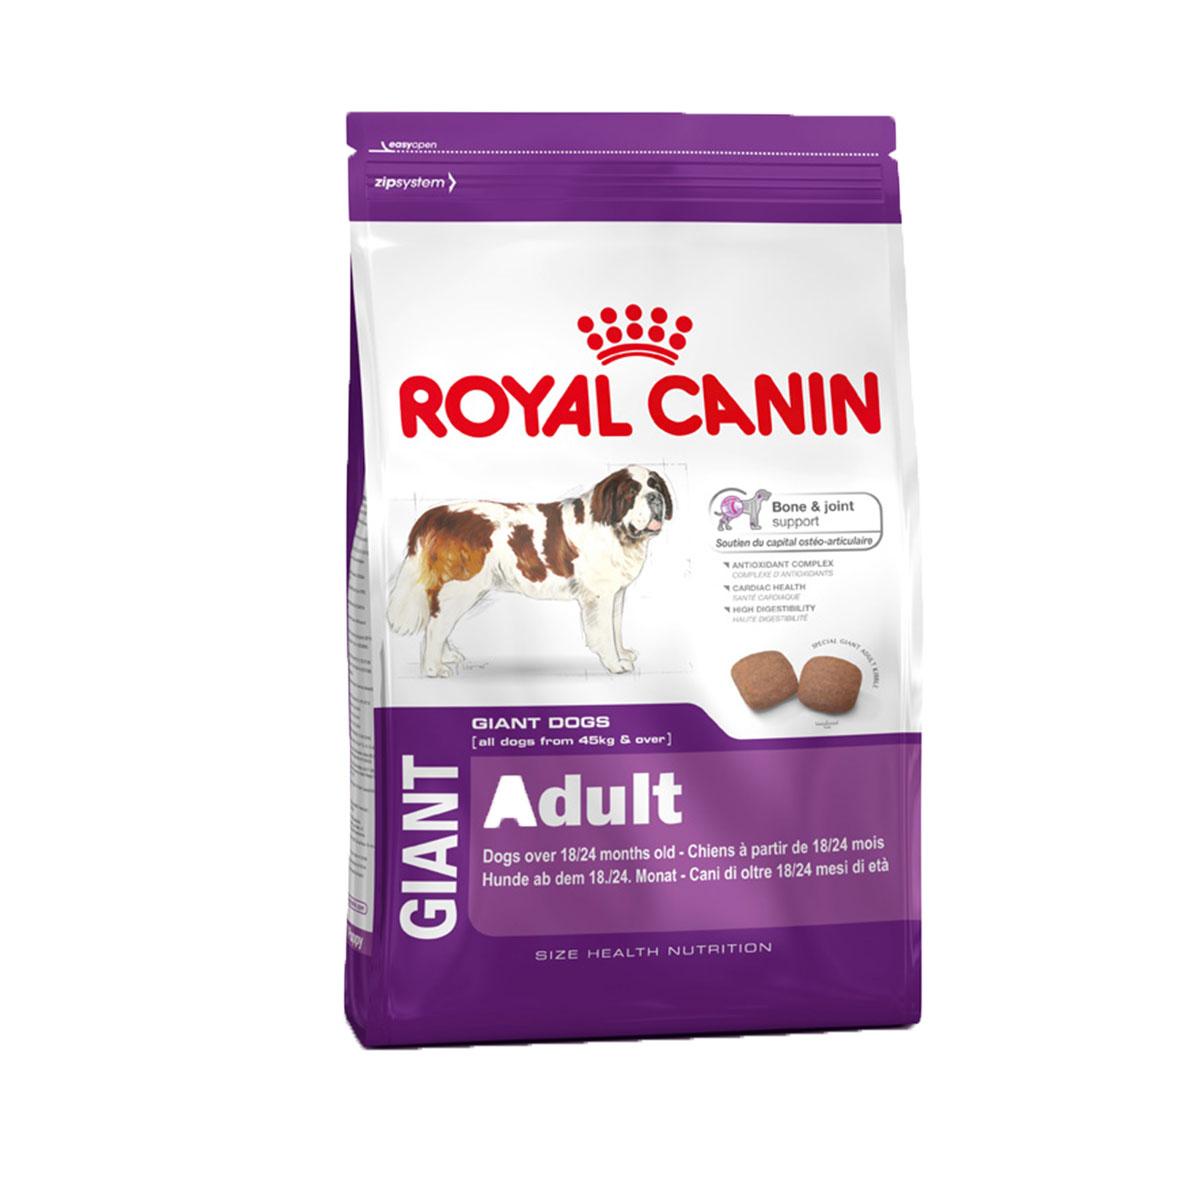 royal canin giant adult g nstig kaufen bei zooroyal. Black Bedroom Furniture Sets. Home Design Ideas